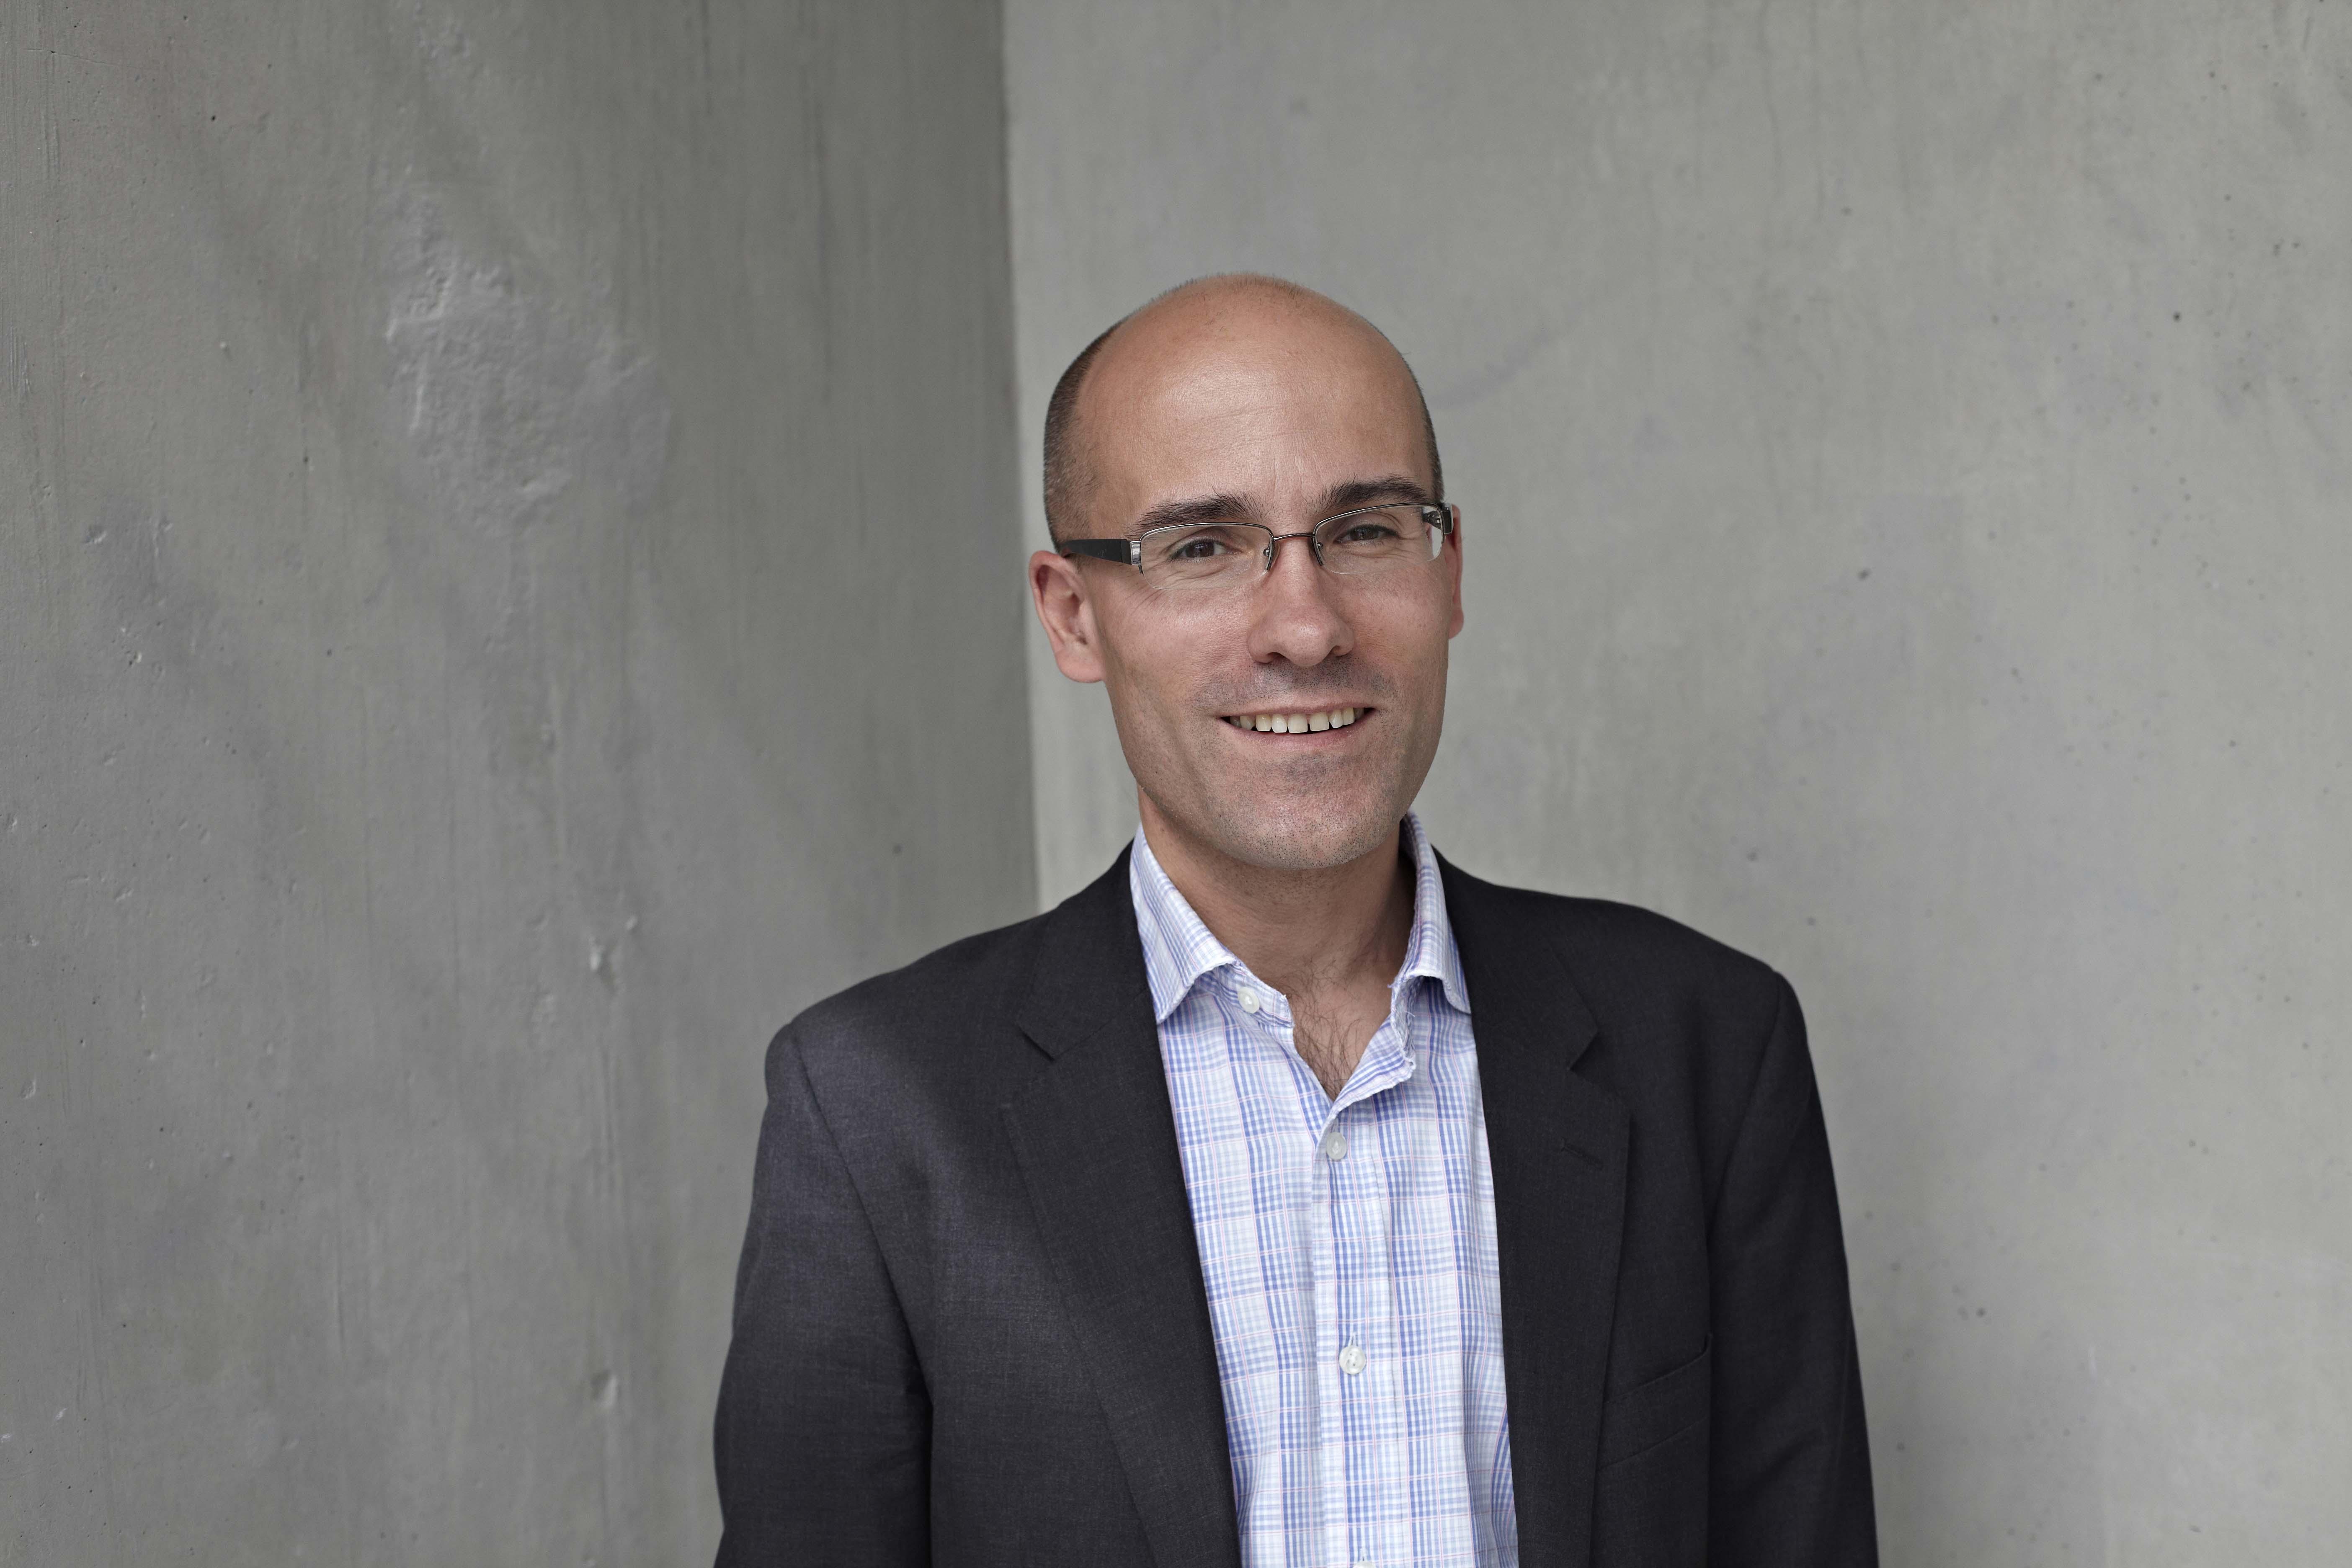 Professor Charles Swanton